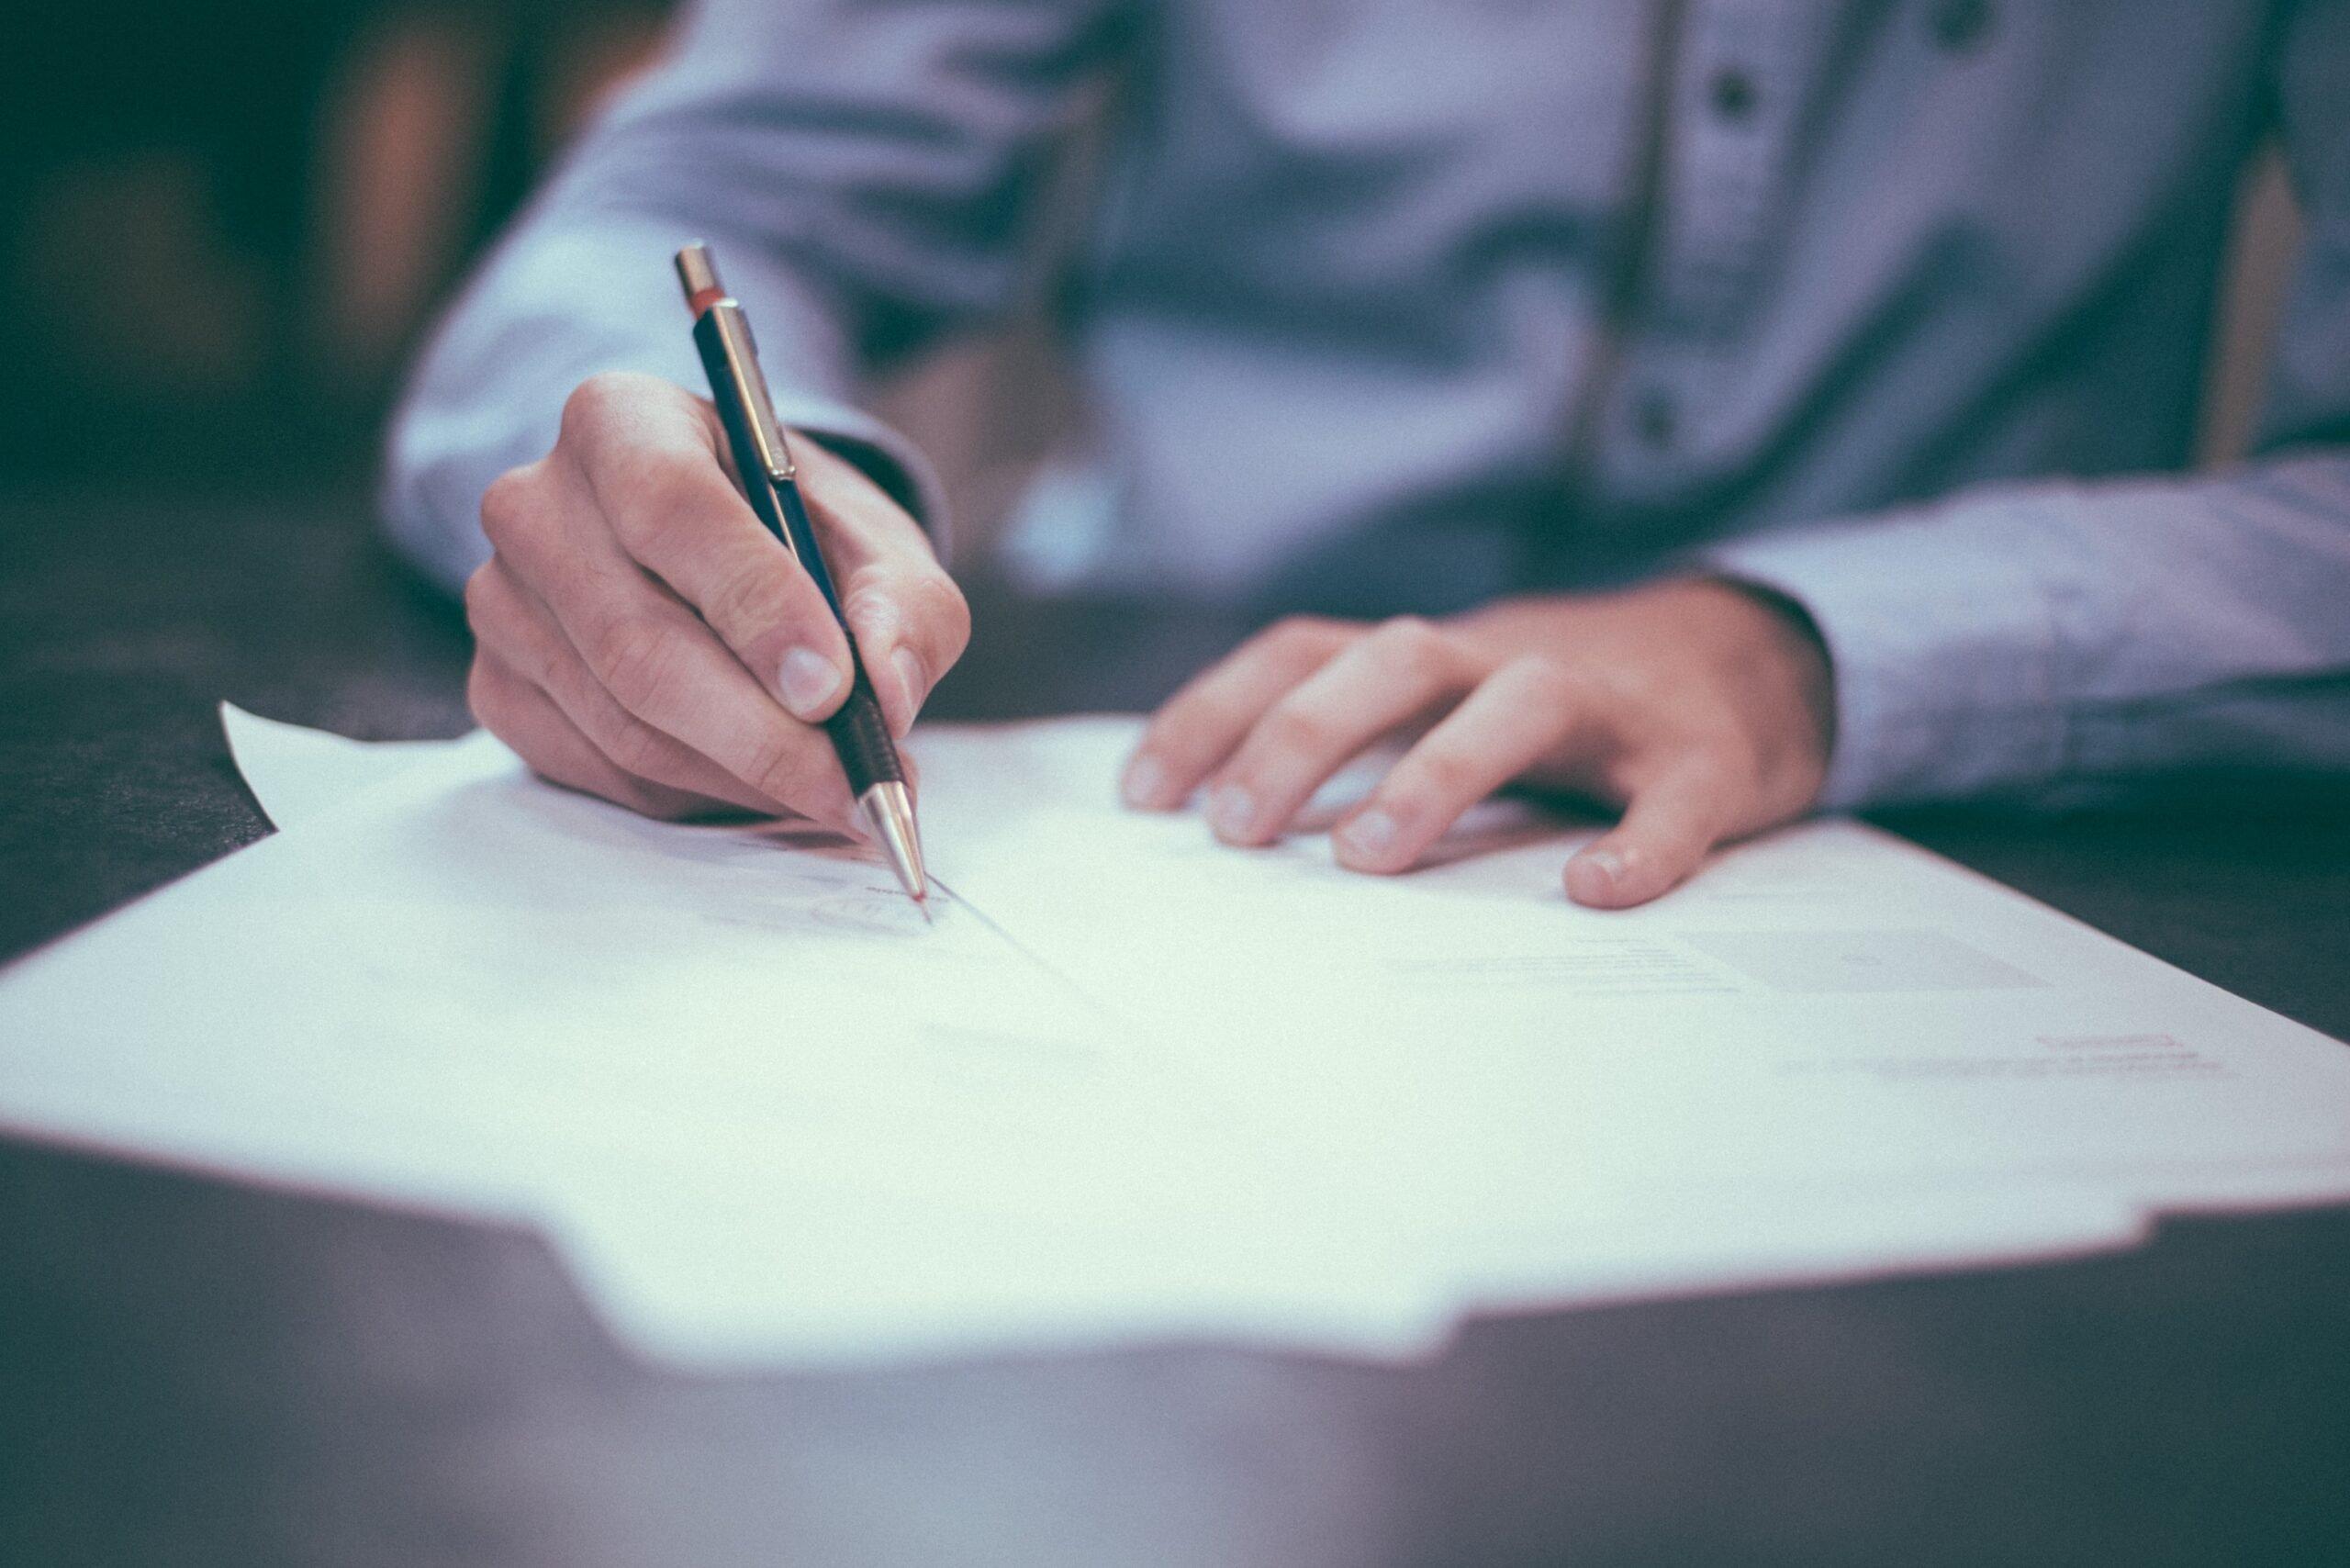 MISLEADING REGISTRATION CERTIFICATES